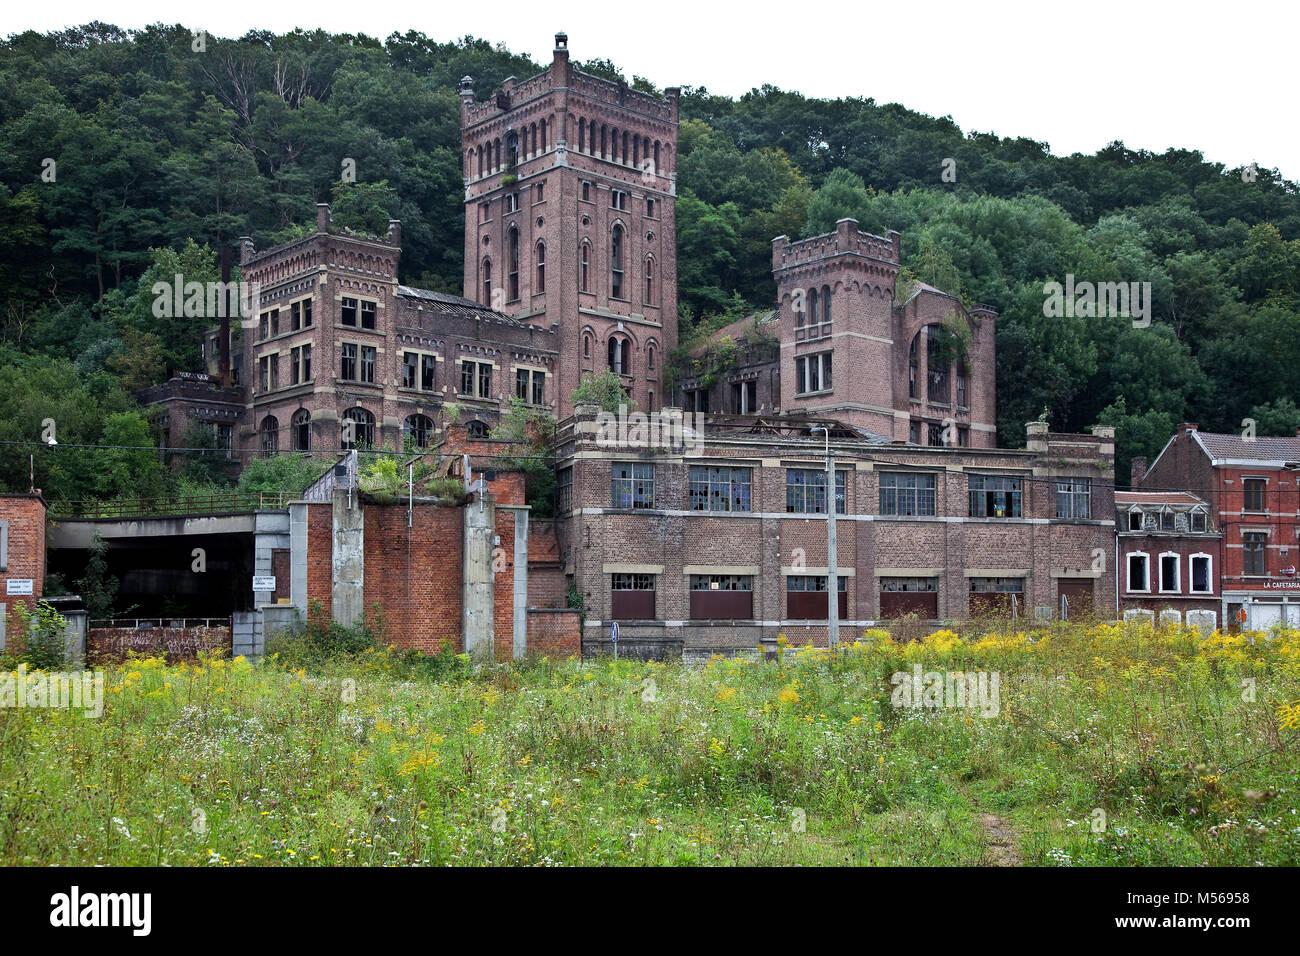 Cheratte, Steinkohlenzeche HASARD, Malakowturm Stock Photo